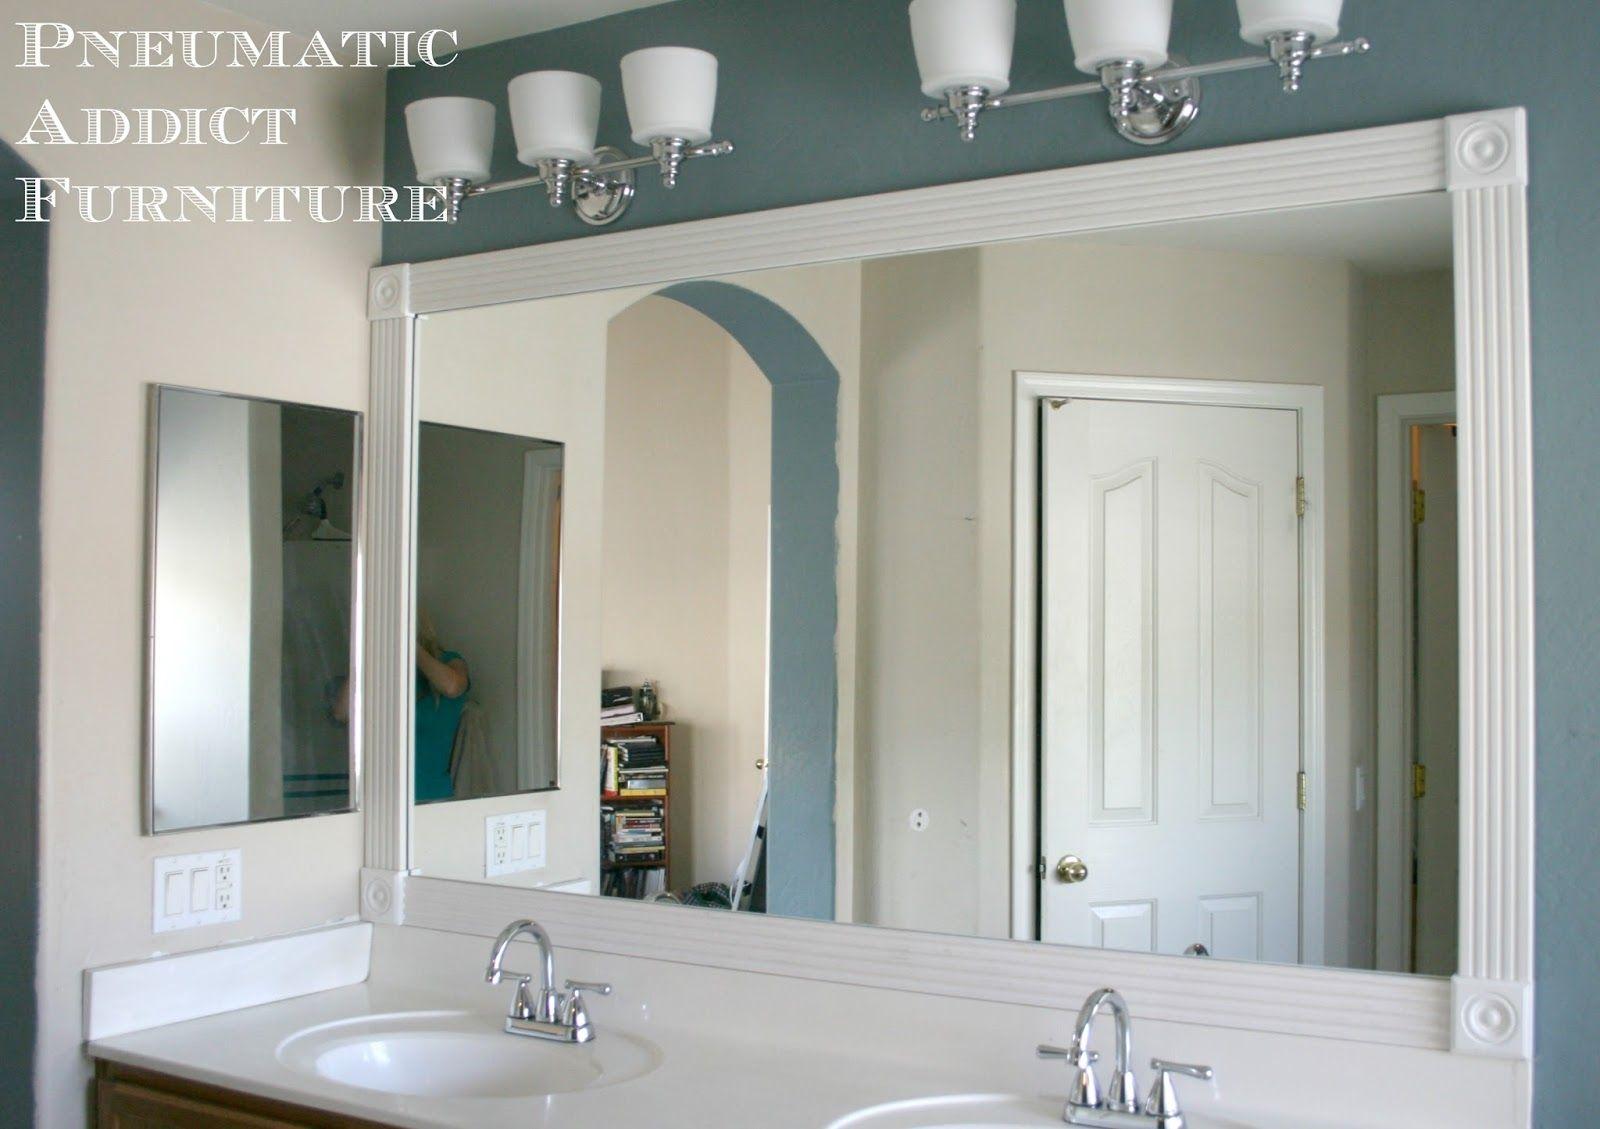 Putting Trim Around Bathroom Mirror Large Bathroom Mirrors Bathroom Mirror Mirror Trim